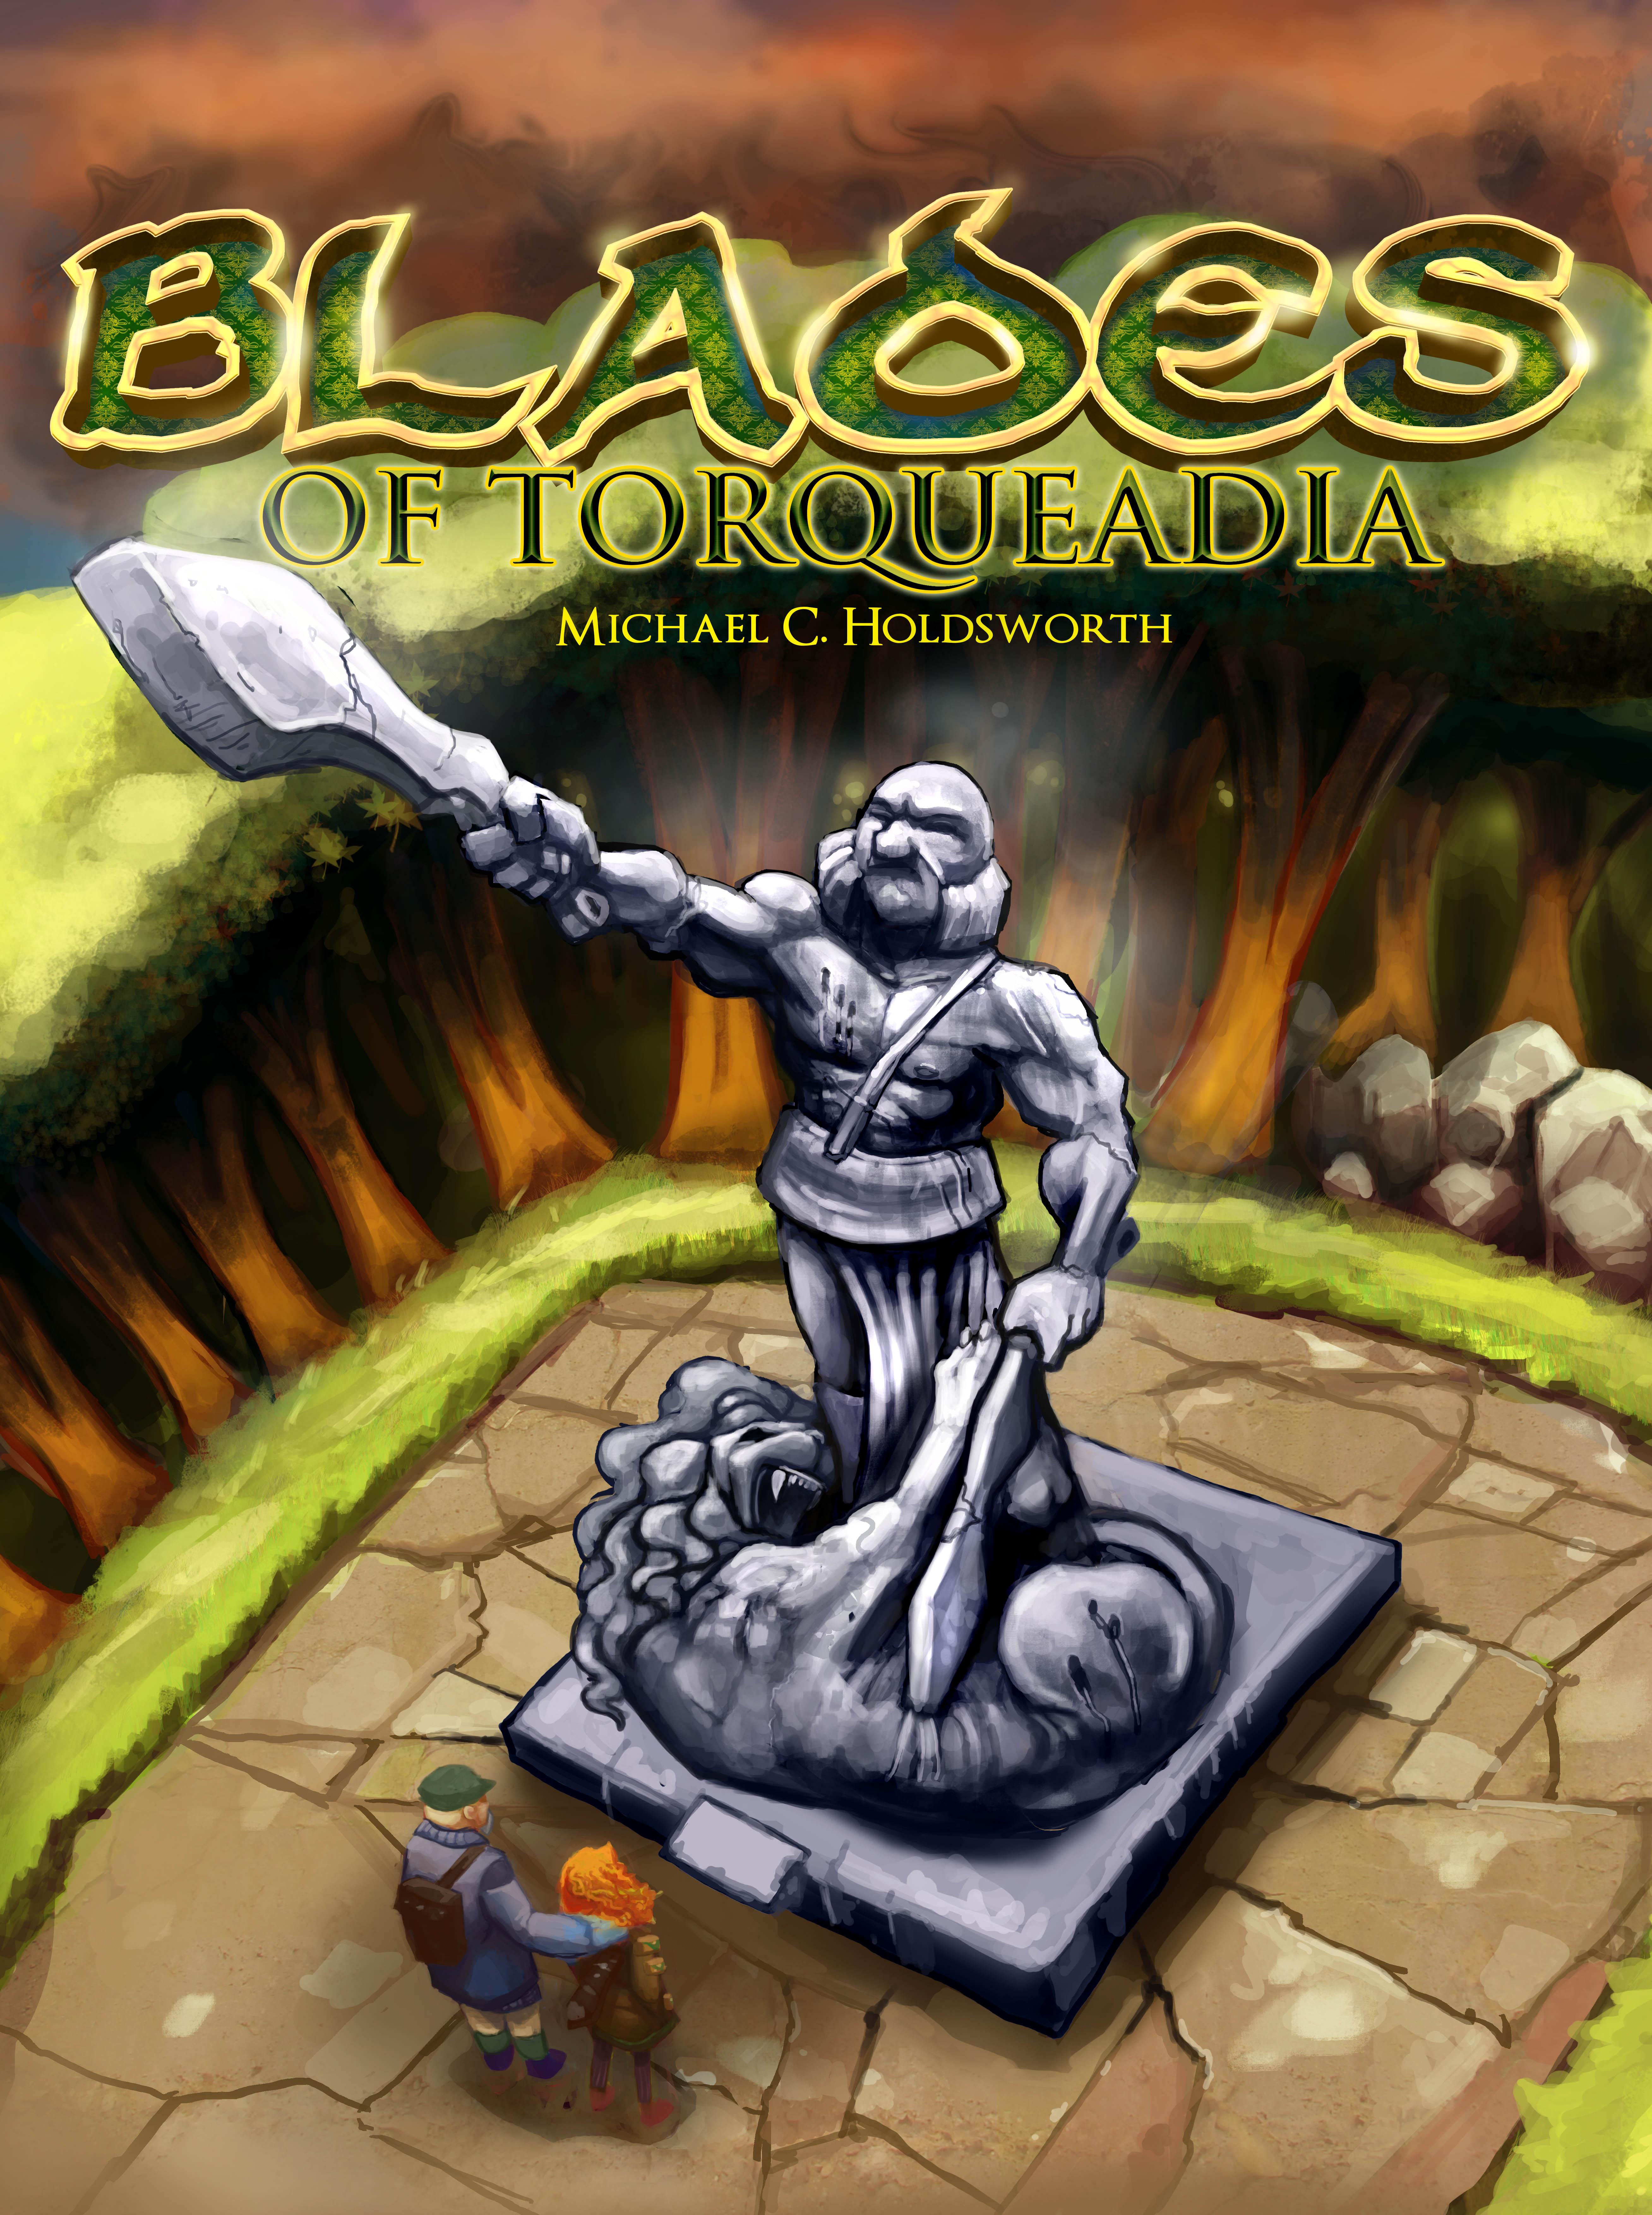 Fantasy book that inspires change and self esteem development